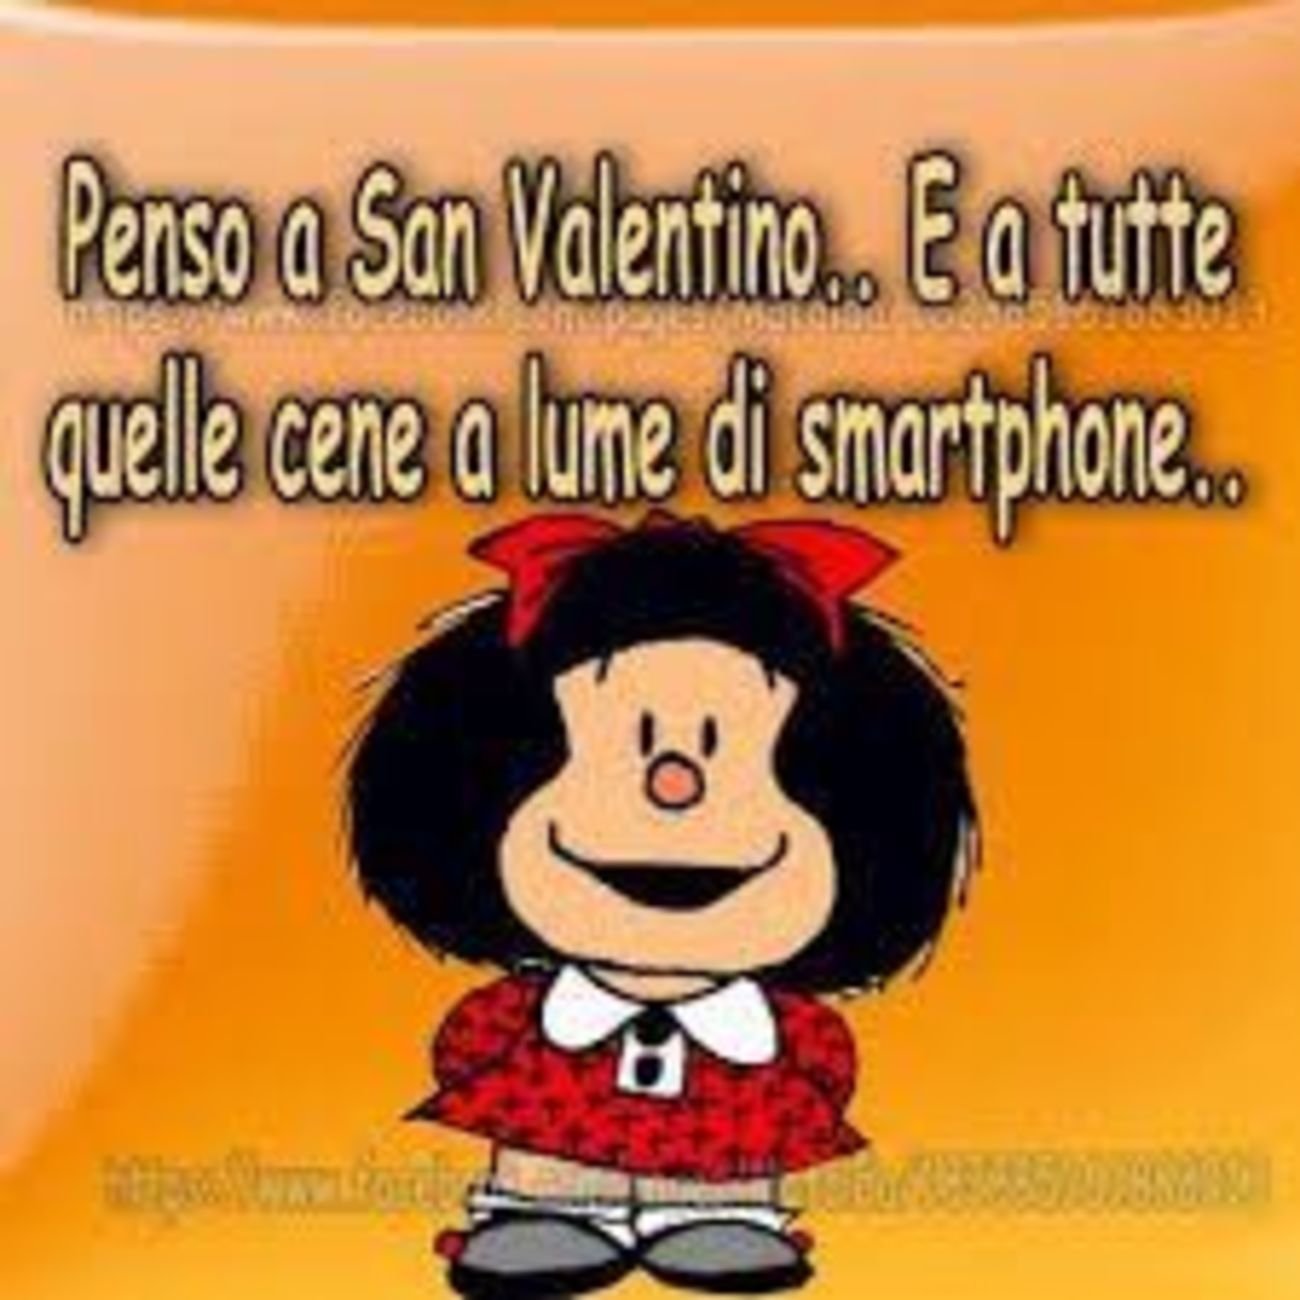 Buon San Valentino immagini Mafalda